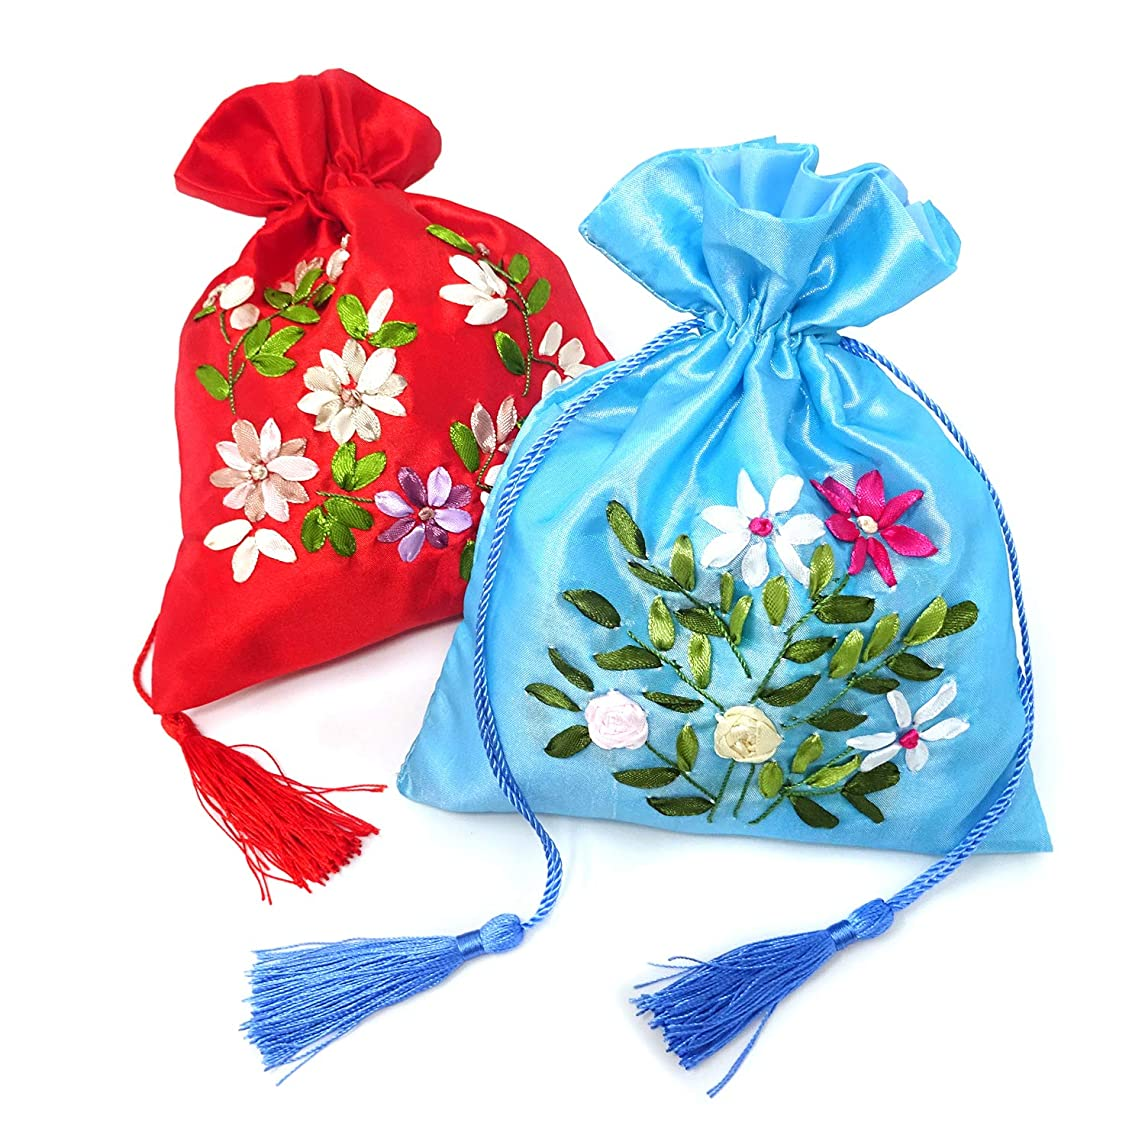 Honbay 2PCS 18x22cm/7.1x8.7inch Drawstring Gift Bags Brocade Silk Jewelry Pouches